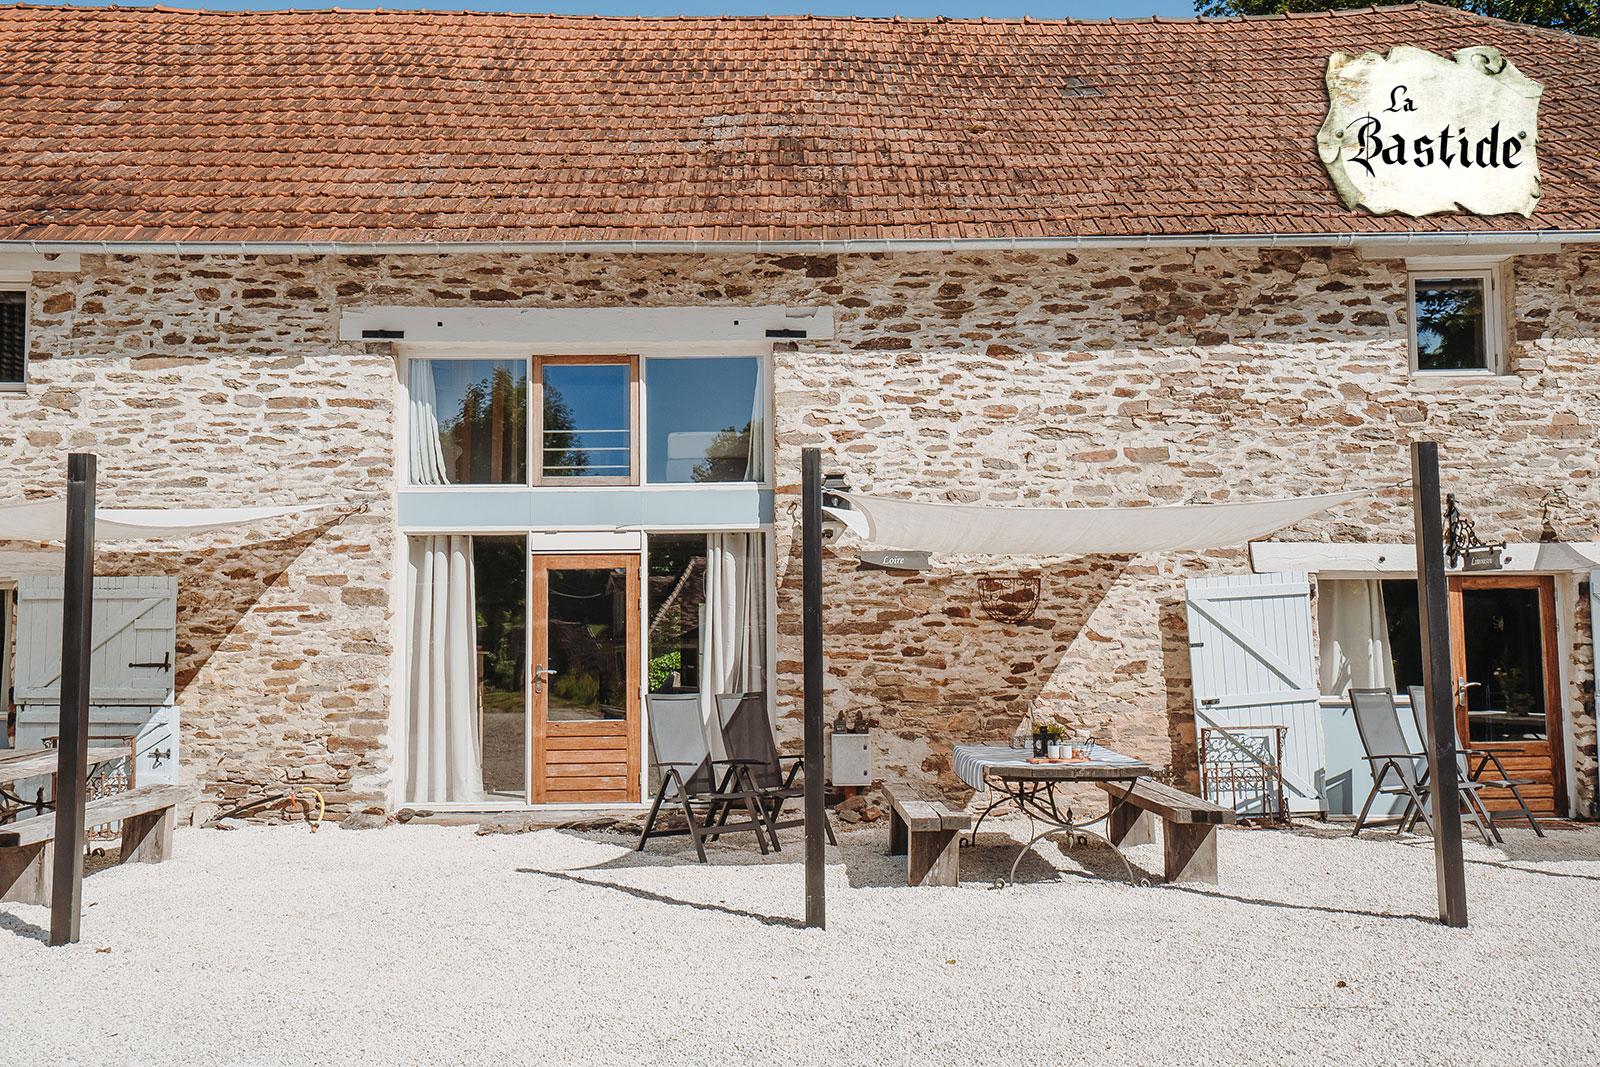 Ferienhaus Loire (4 Personen)